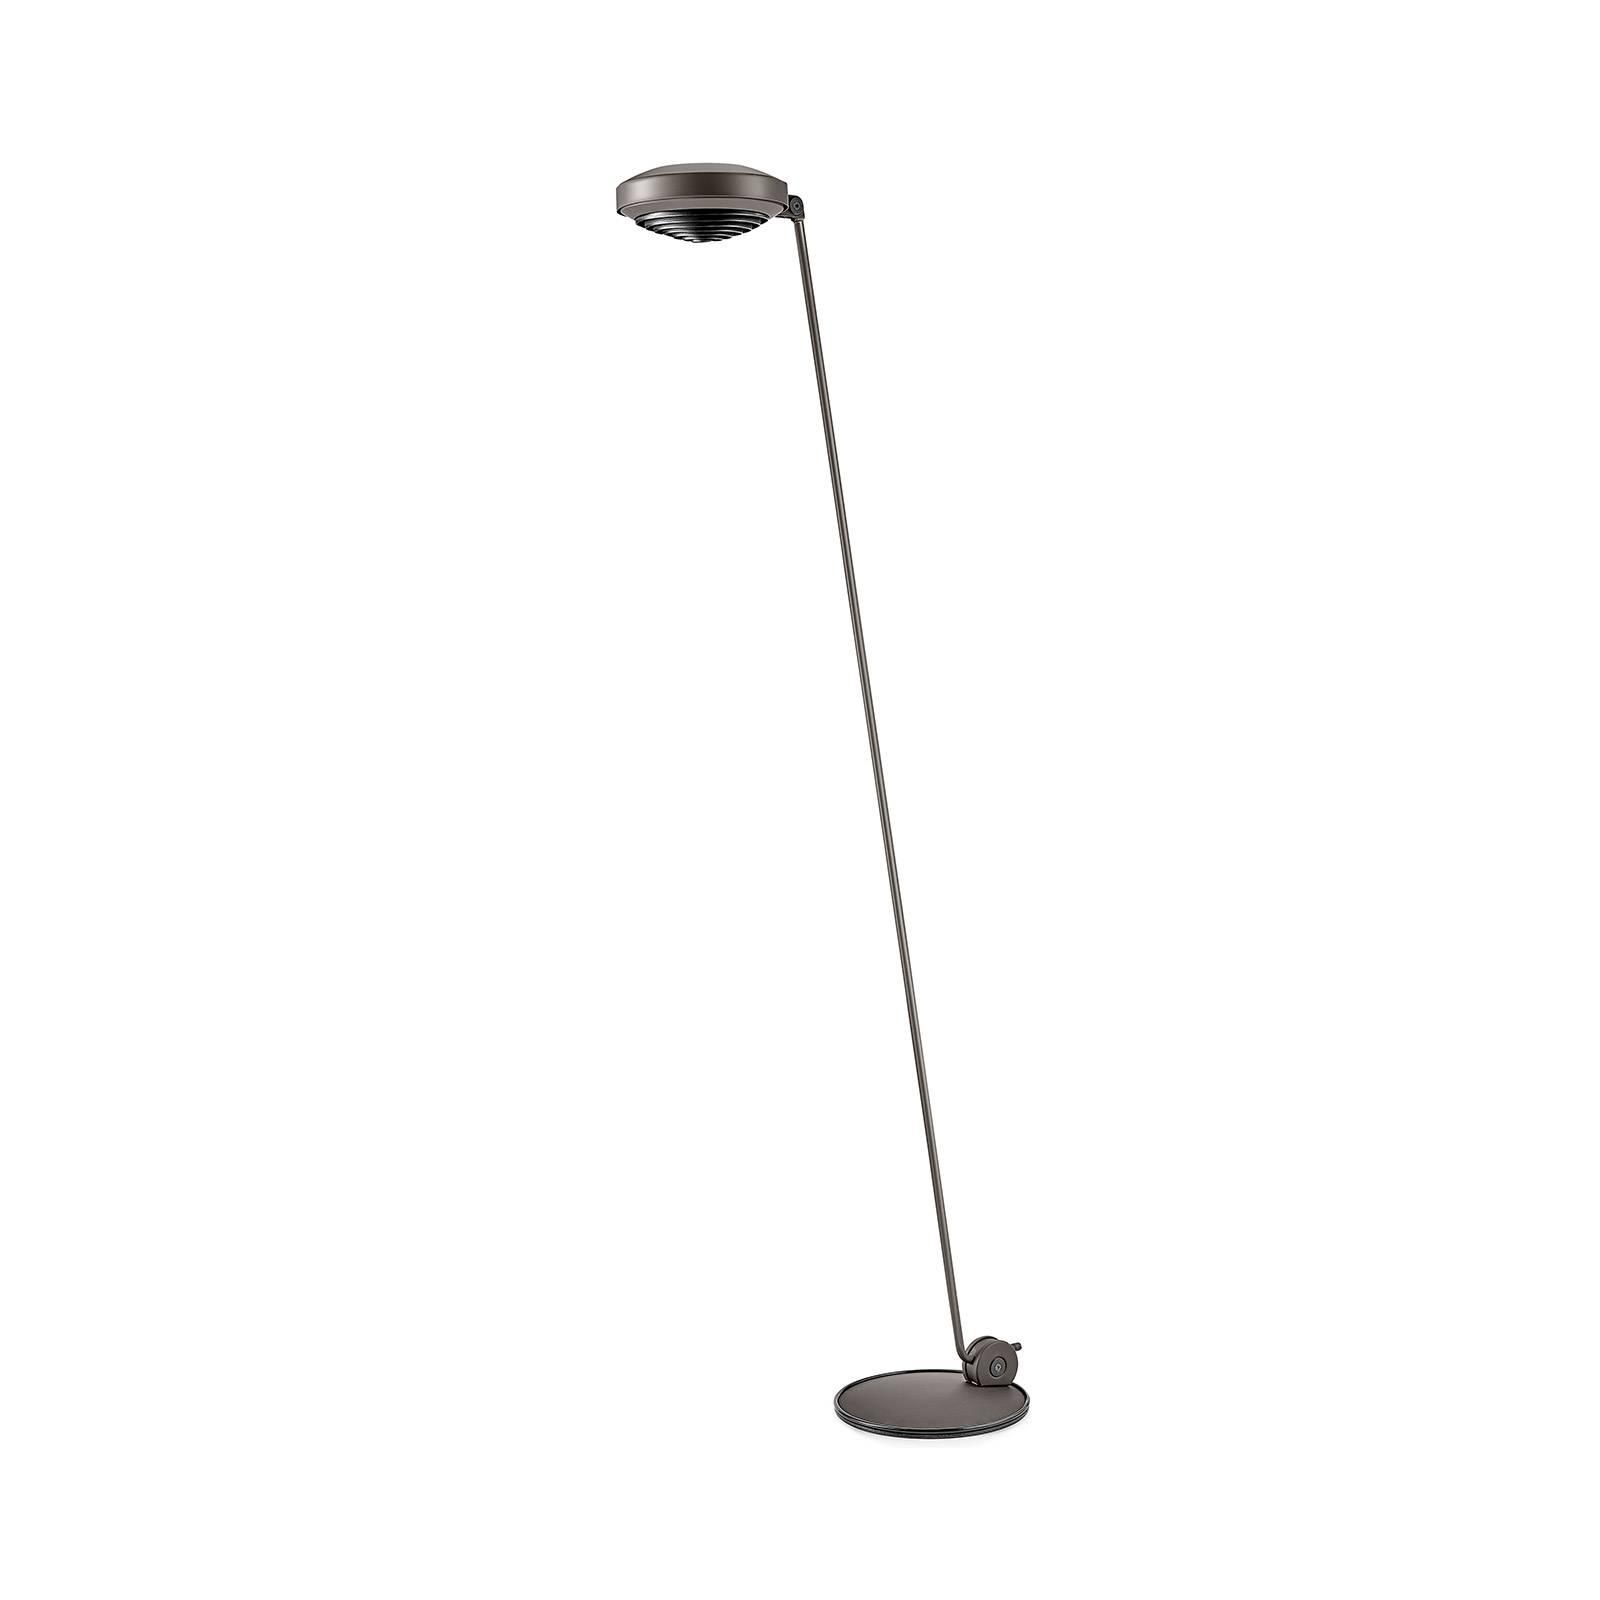 Lumina Elle 1 -LED-lattiavalo 180 cm, pronssi